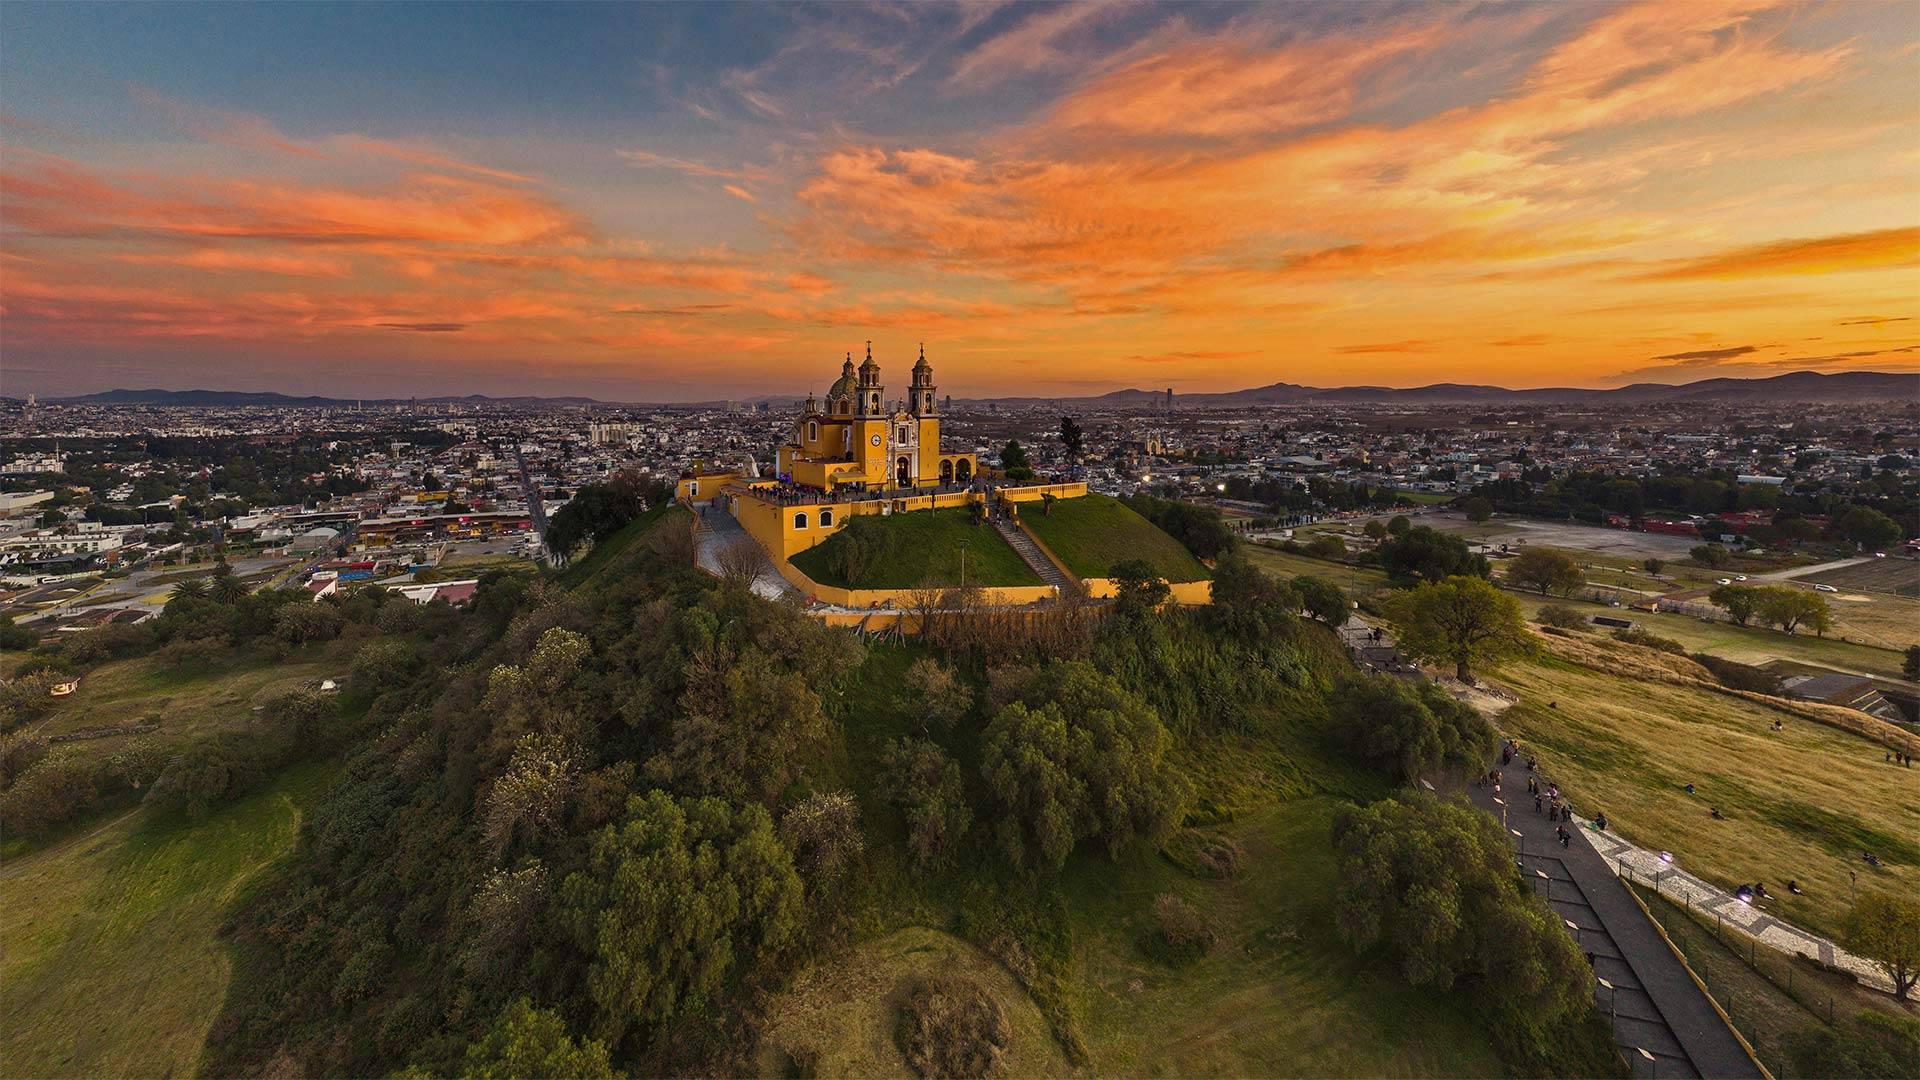 La Grande Pyramide de Cholula, Cholula, Puebla, Mexique (© mauritius images GmbH/Alamy)(Bing France)